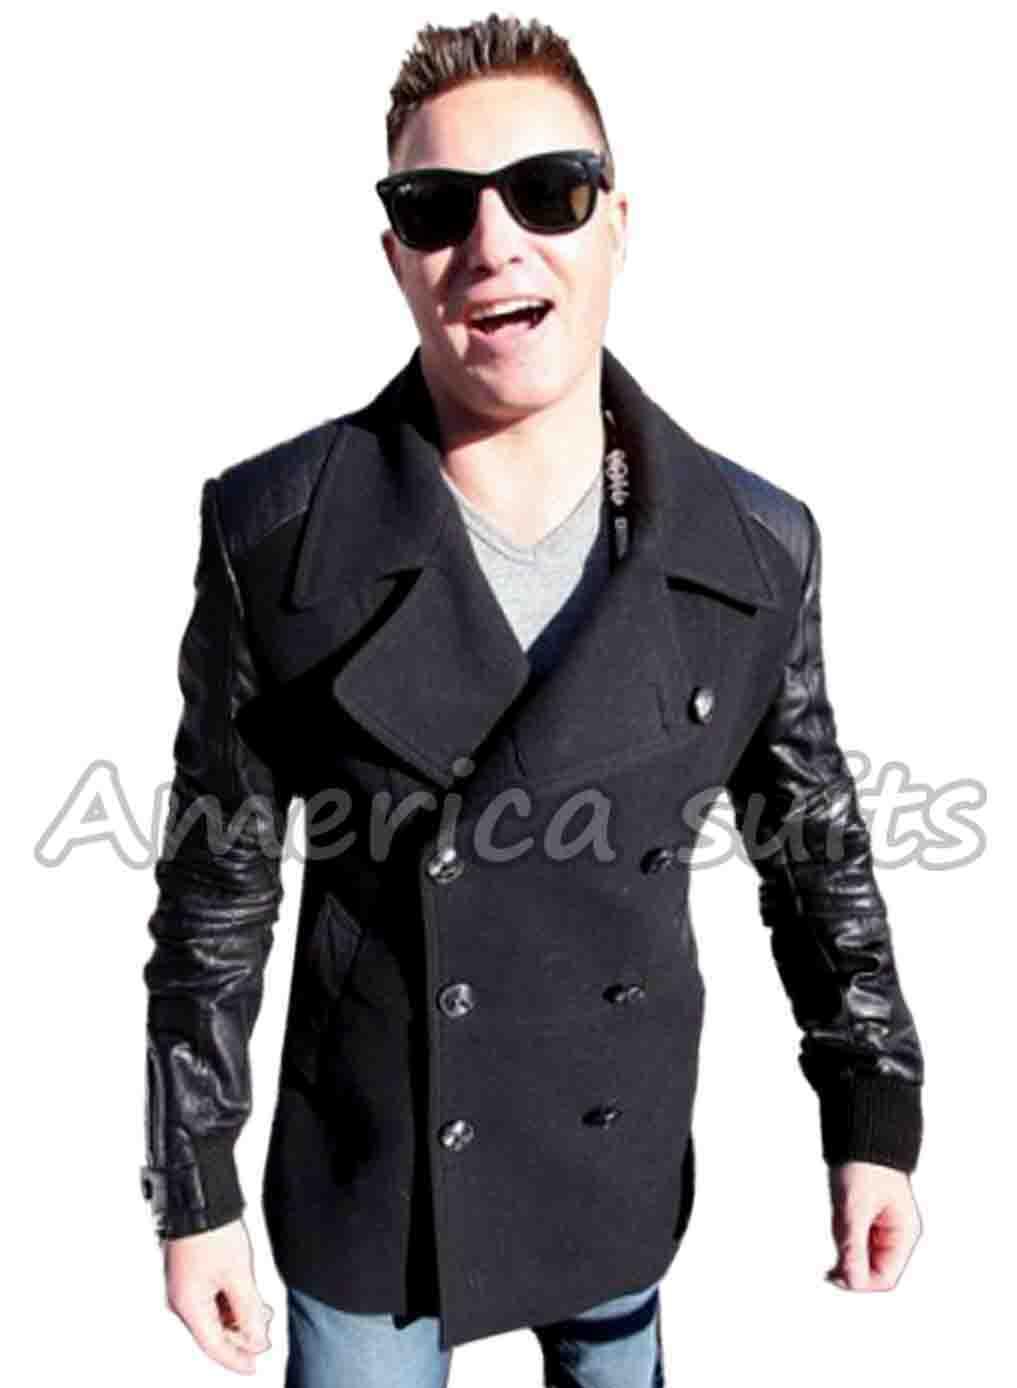 camp-xray-lane-garrison-black-leather-jacket-500x500 (2)